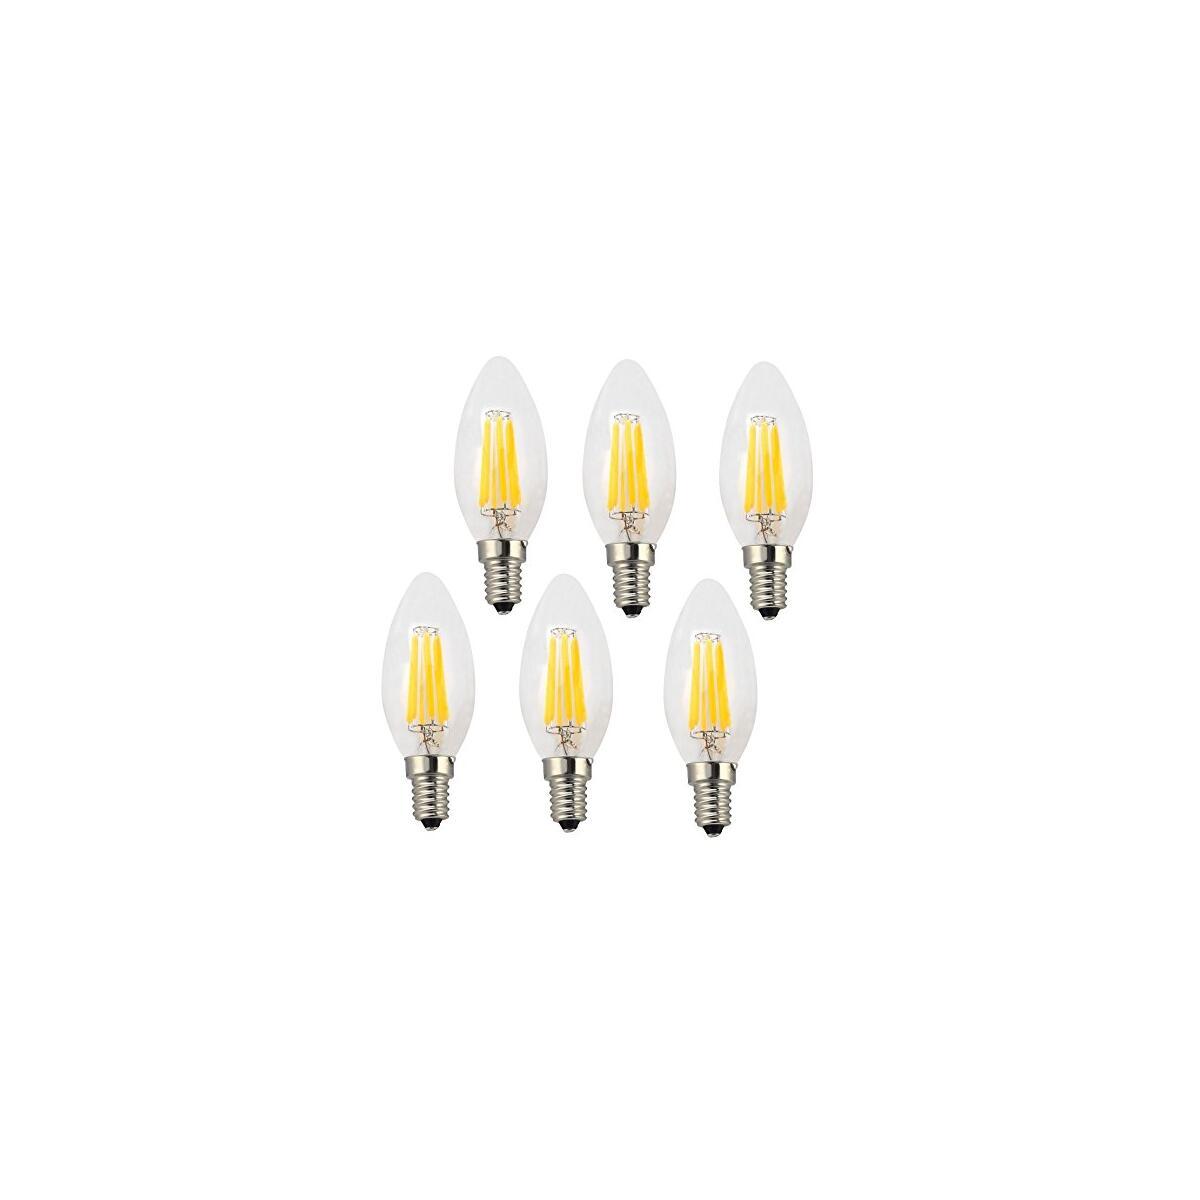 LED E12 Candelabra 4 Watt Equivalent To 40 Watt 2700K Filament Light Bulb (Torpedo Tip - 6 Pack)